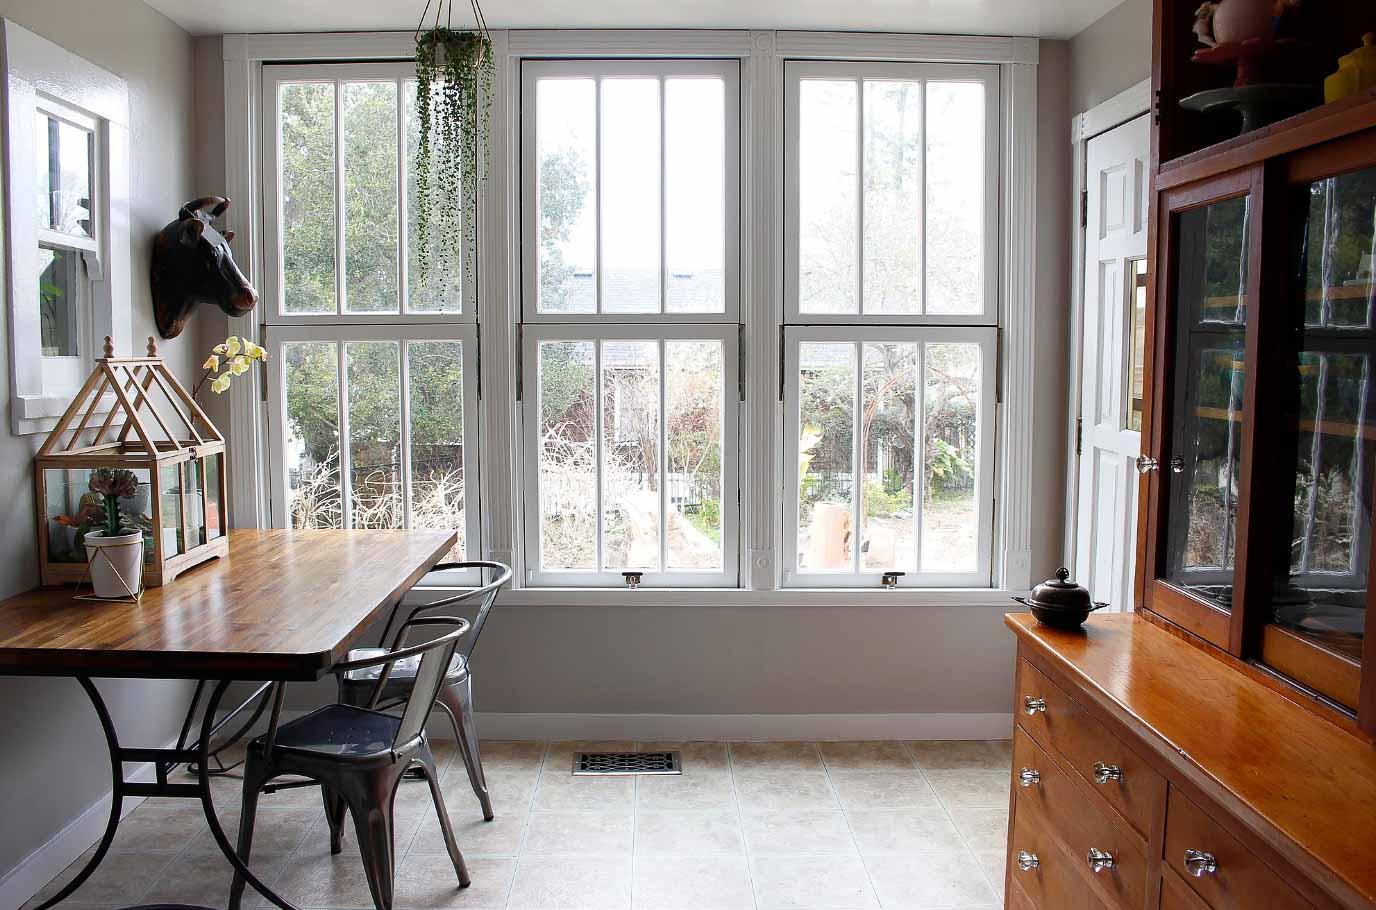 Petaluma-Place-natural-light-photography-studio-lifestyle-photo-ideas-indoor-photoshoot-location-13.jpg